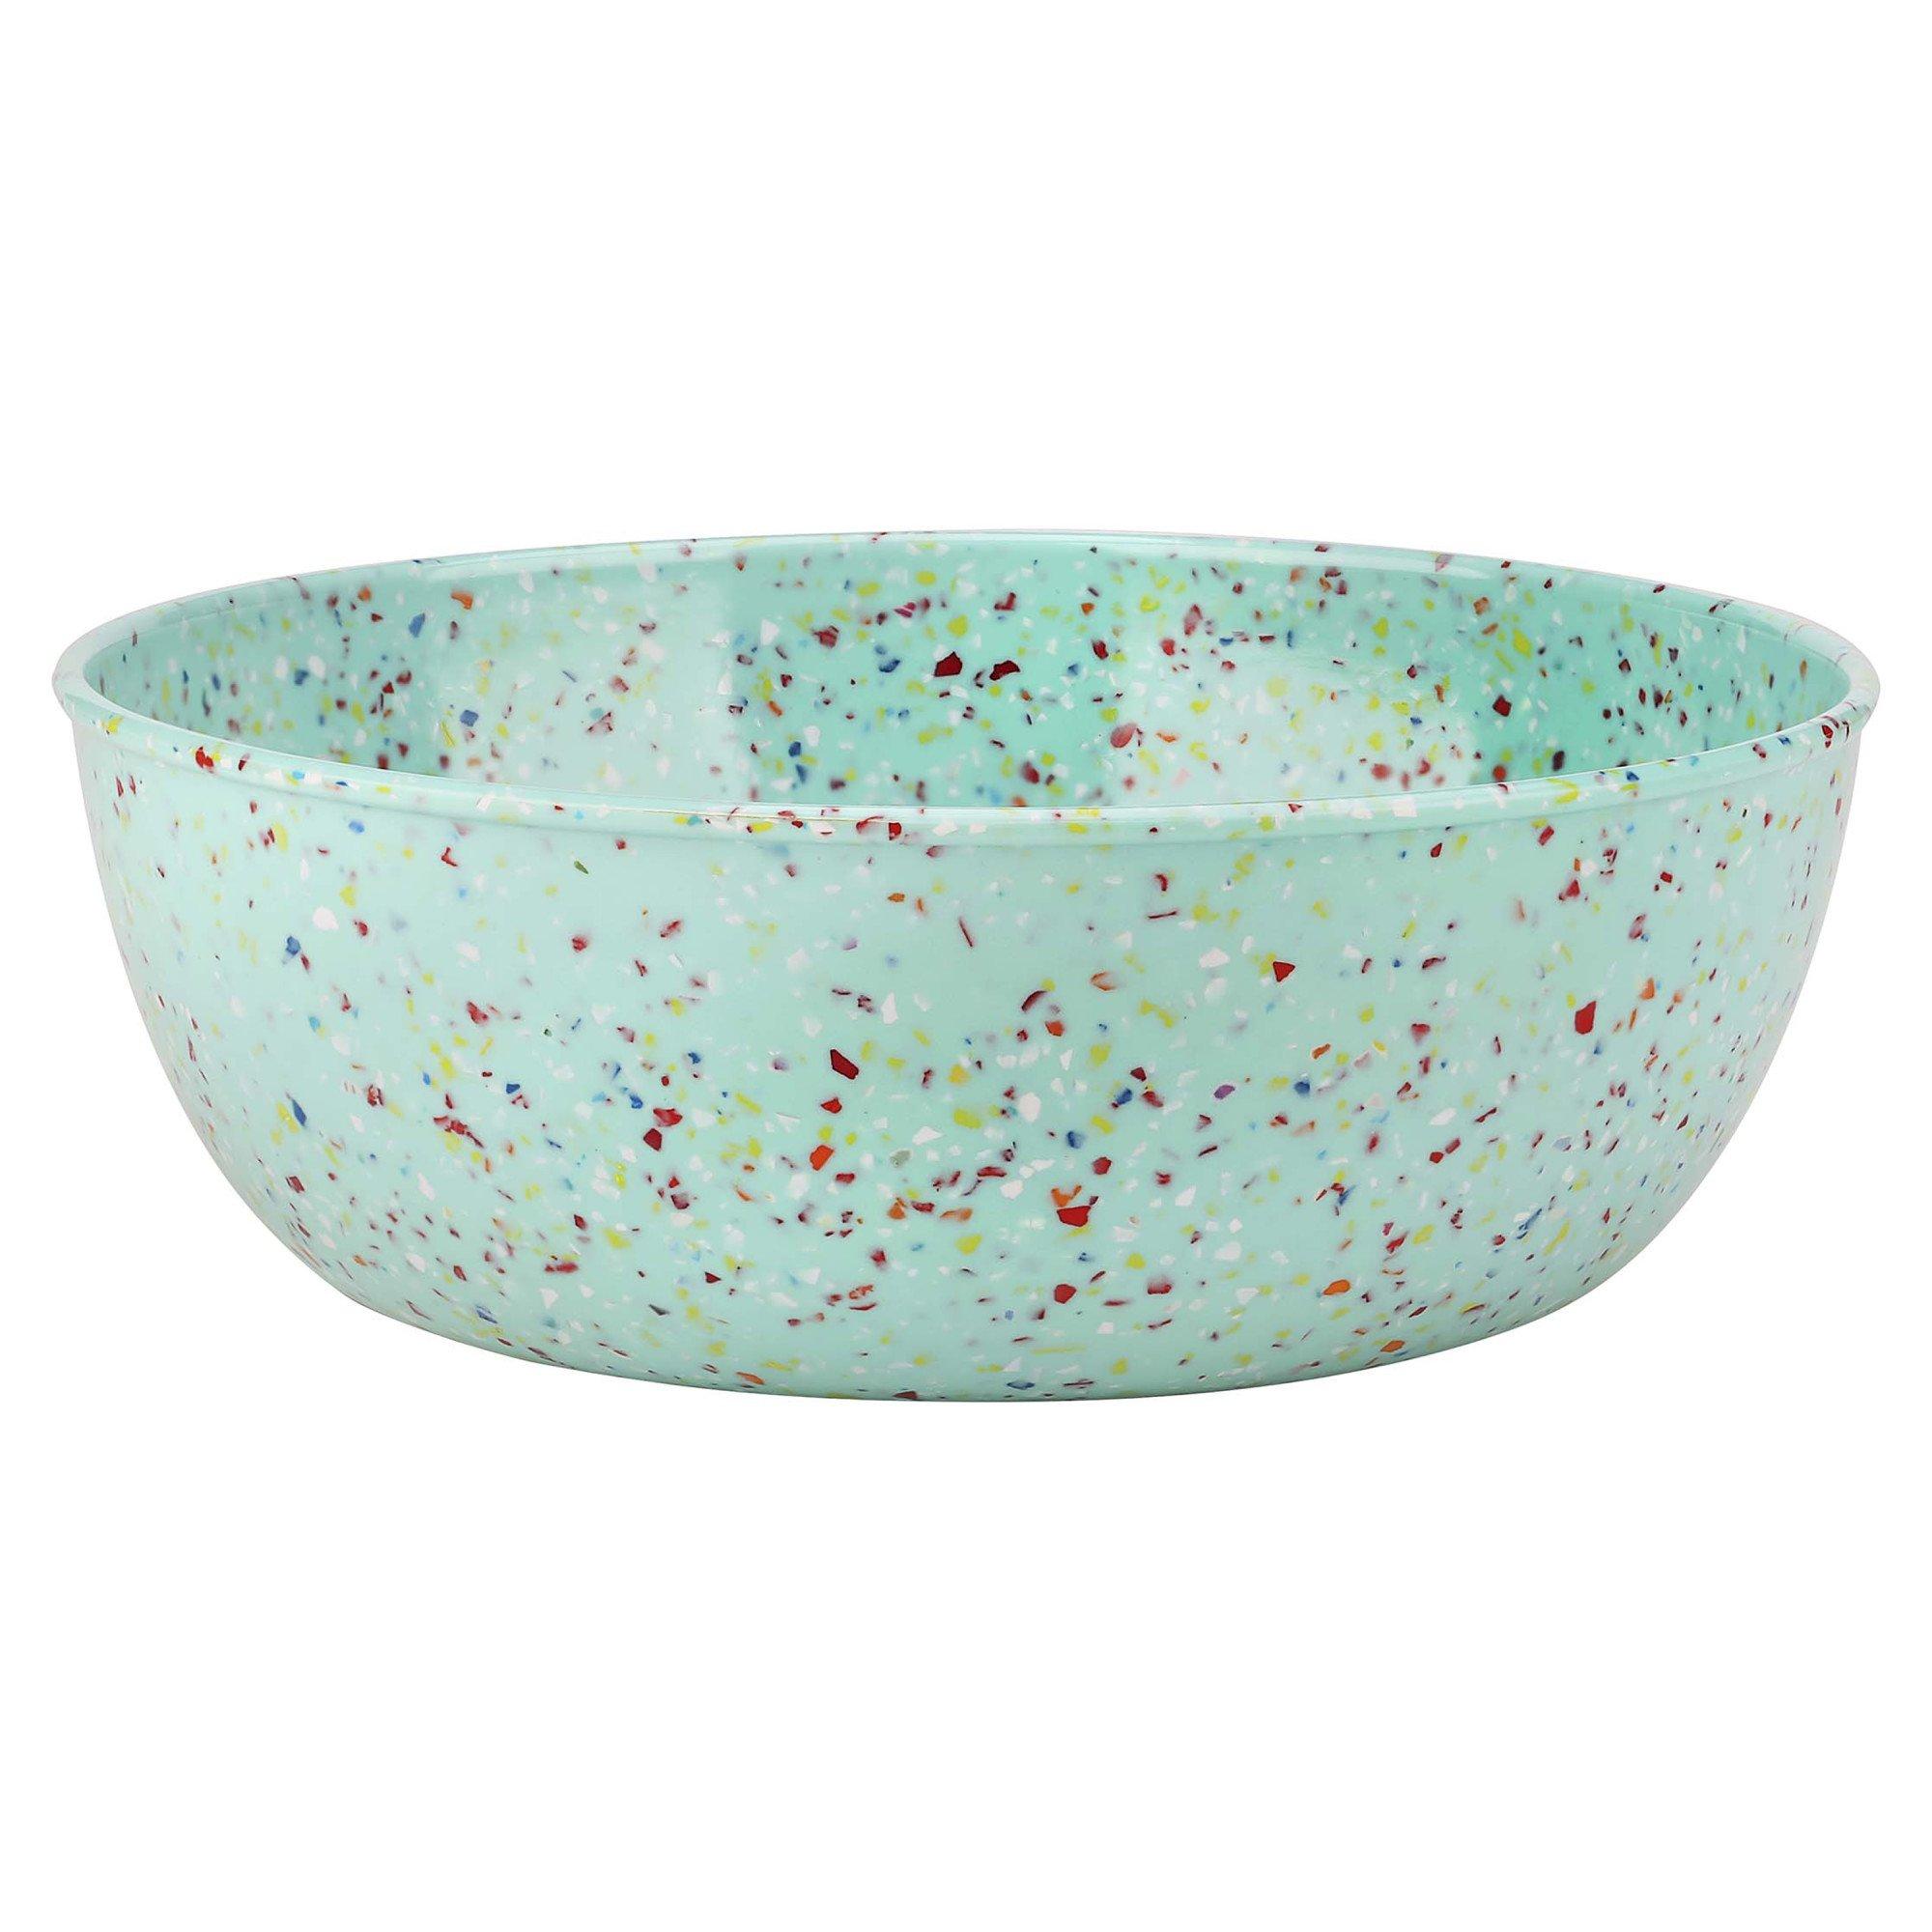 Zak Designs 2316-0322-AMZ Confetti Serving Bowls, Mint LS